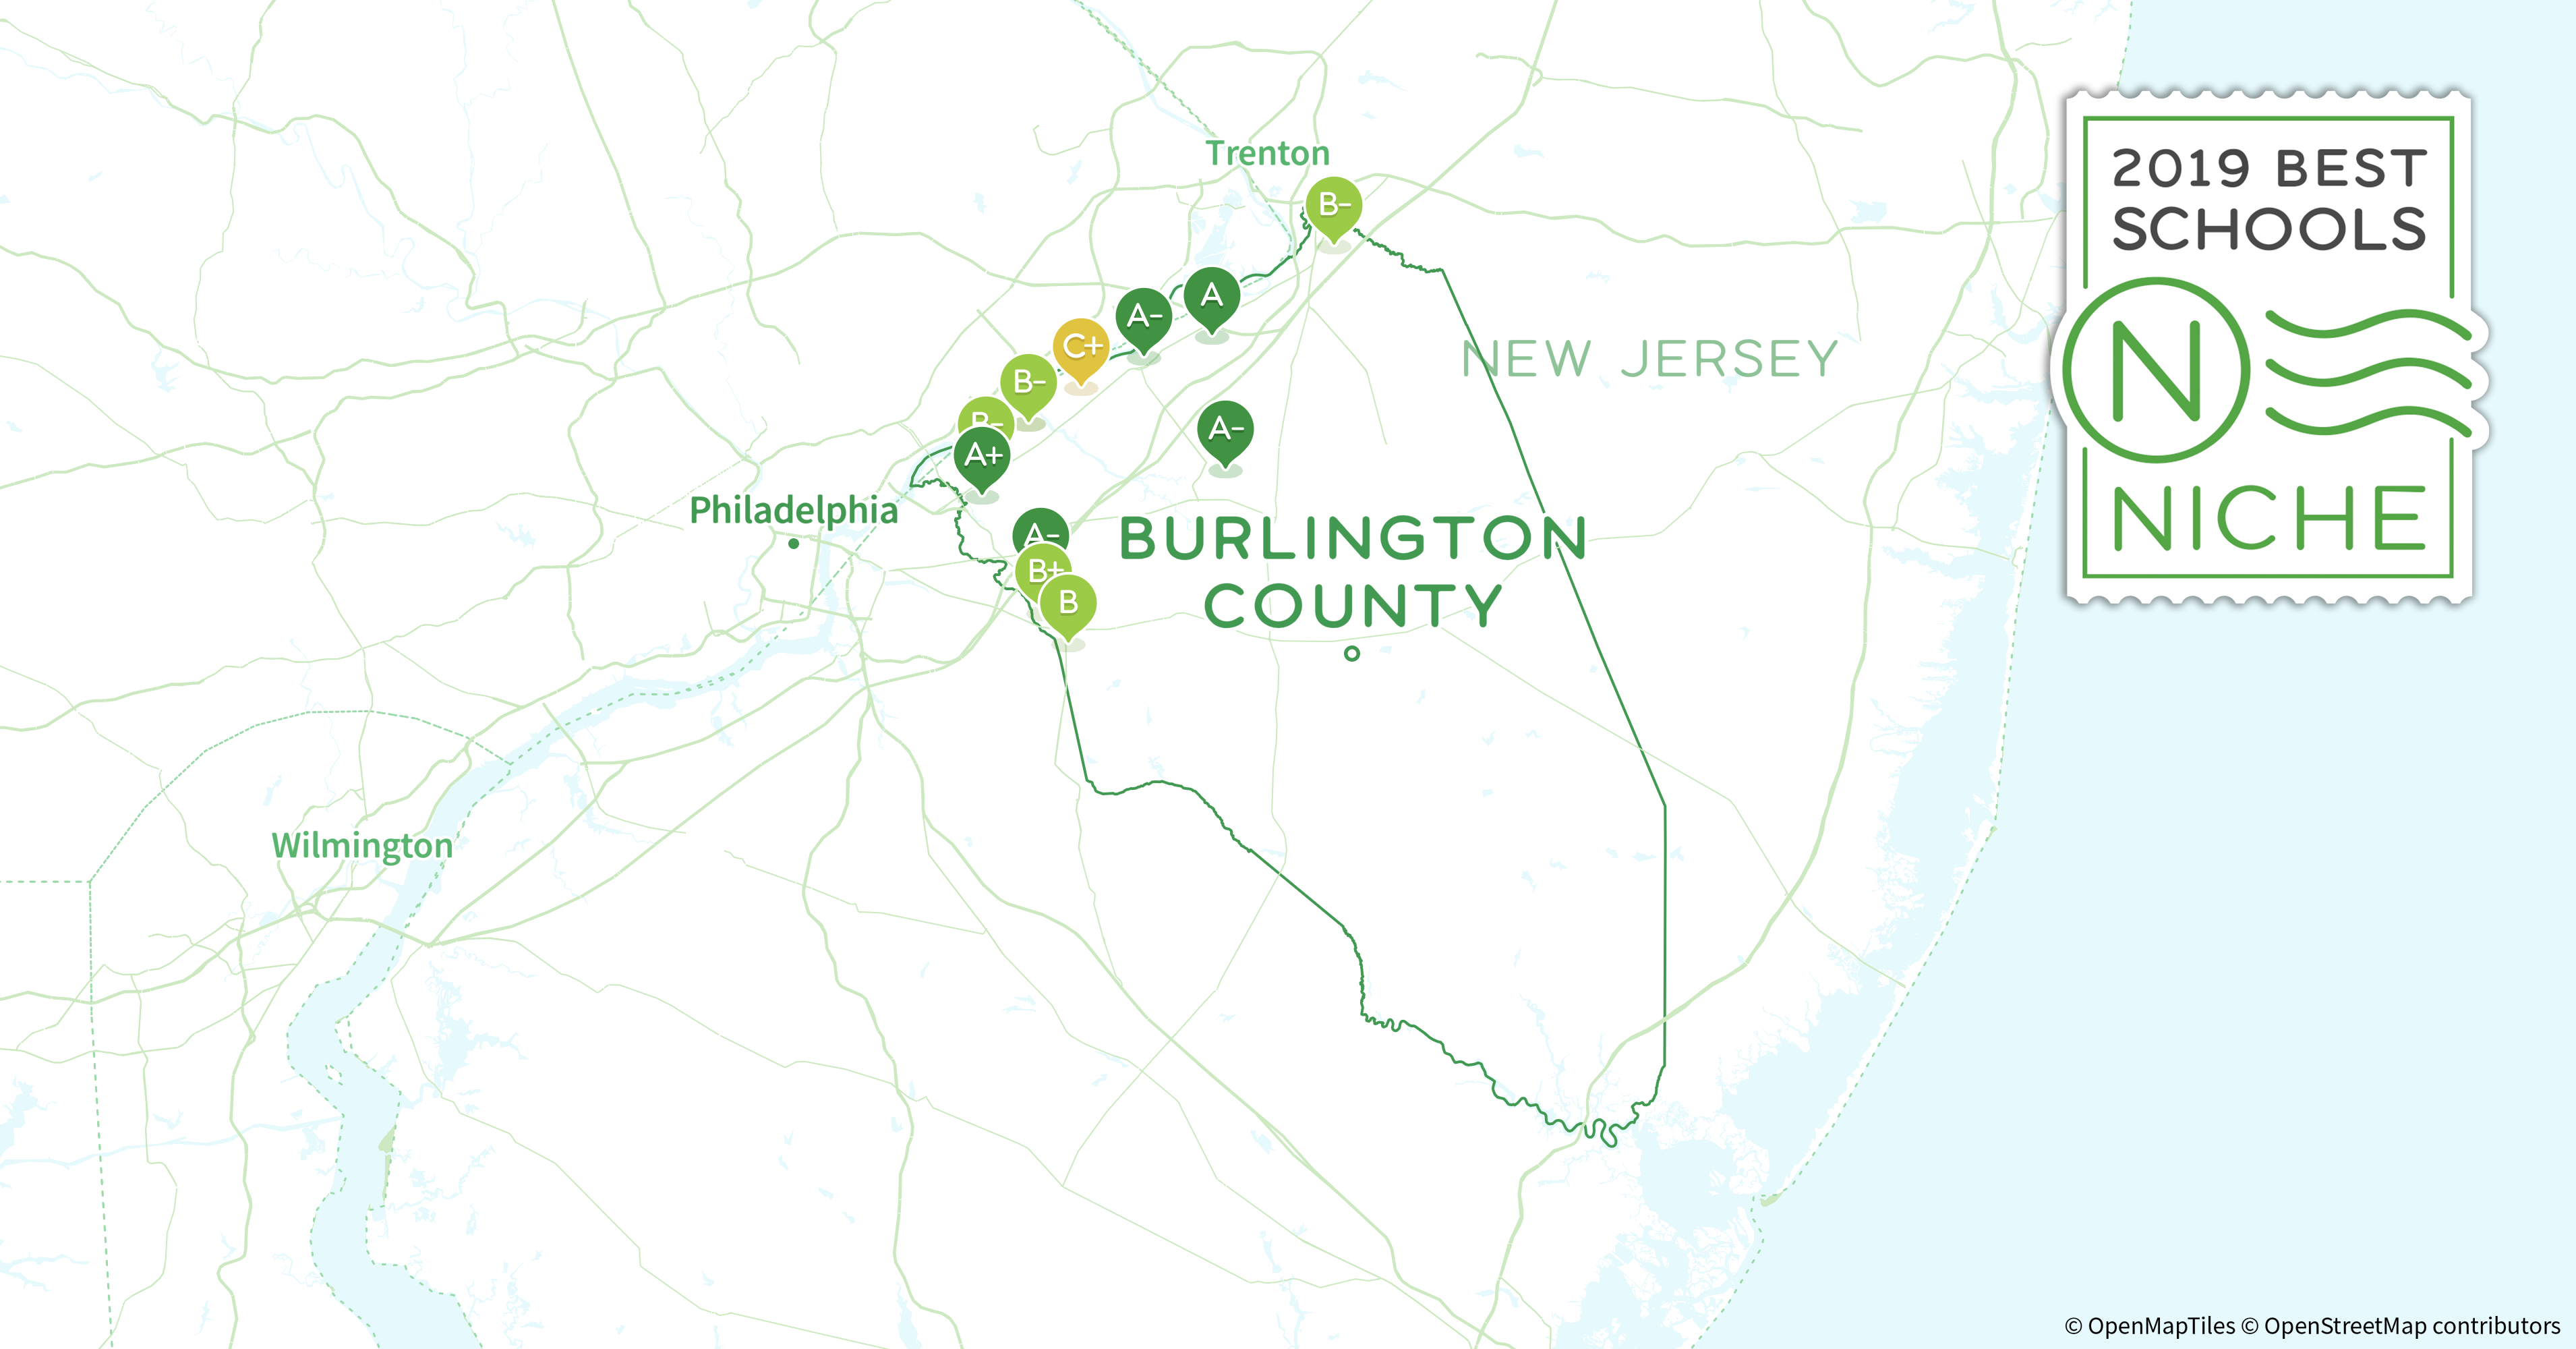 Districts in Burlington County, NJ - Niche on